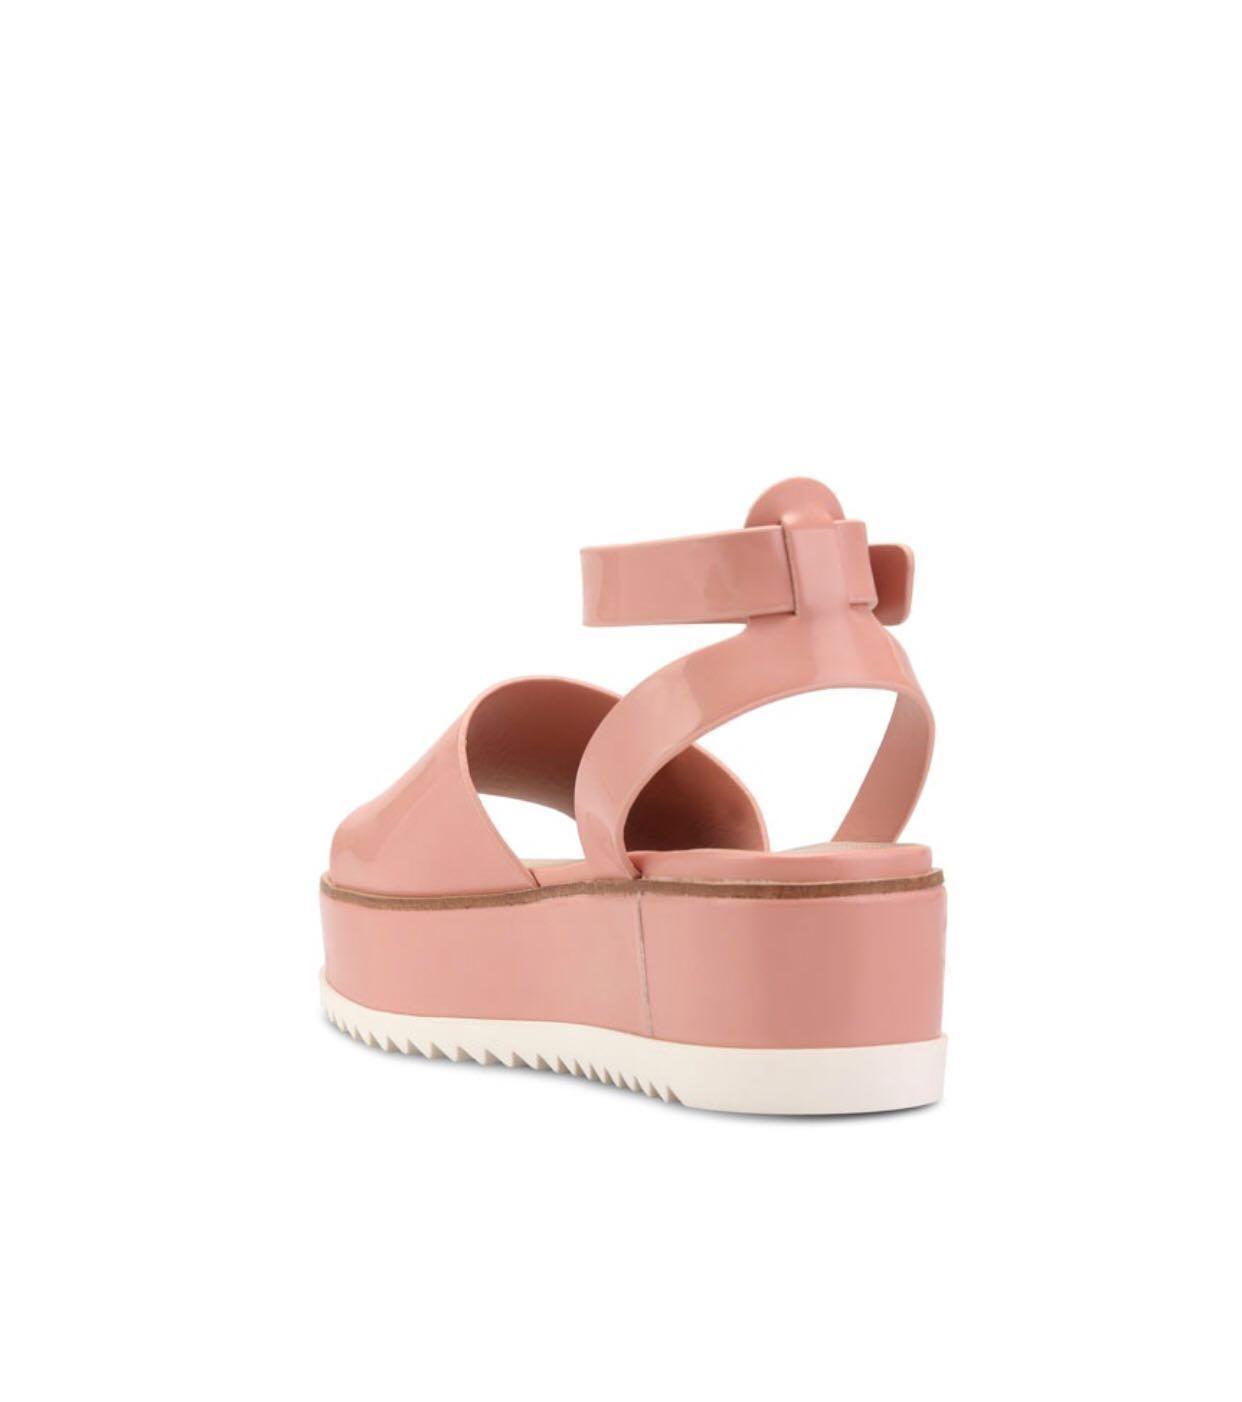 ALDO Jadde Platform Sandals, Women's